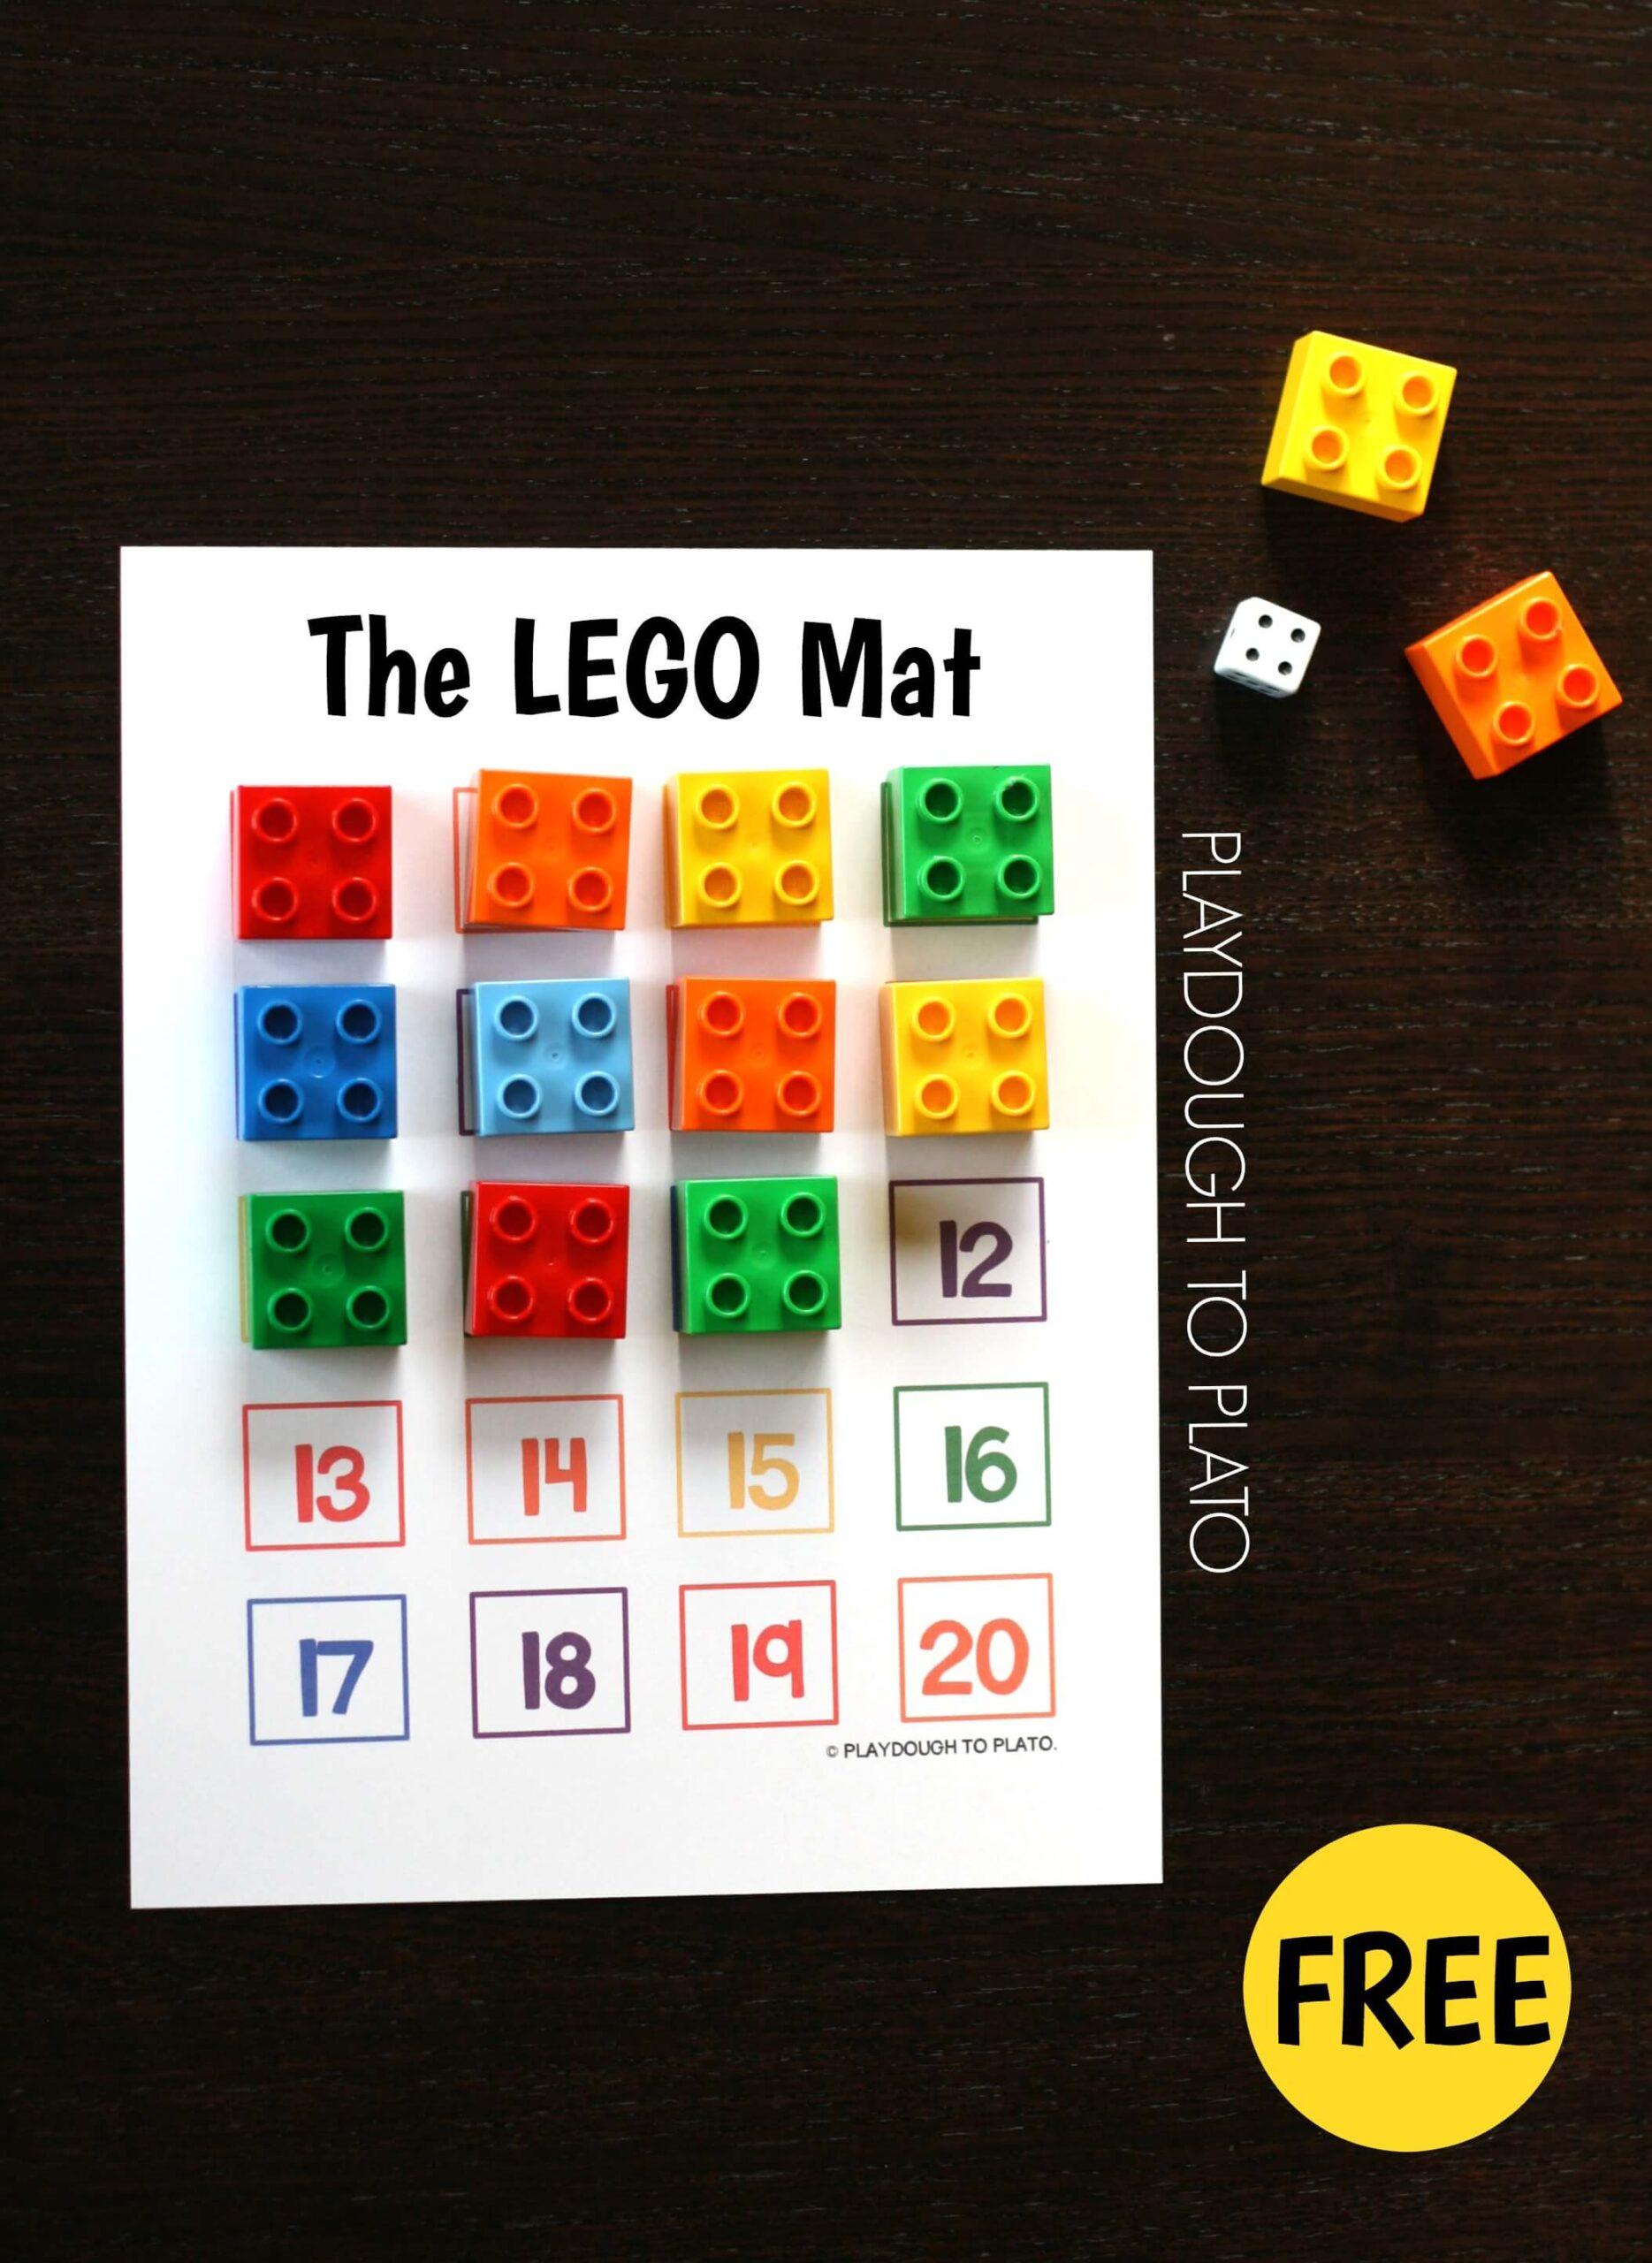 Free LEGO Mat